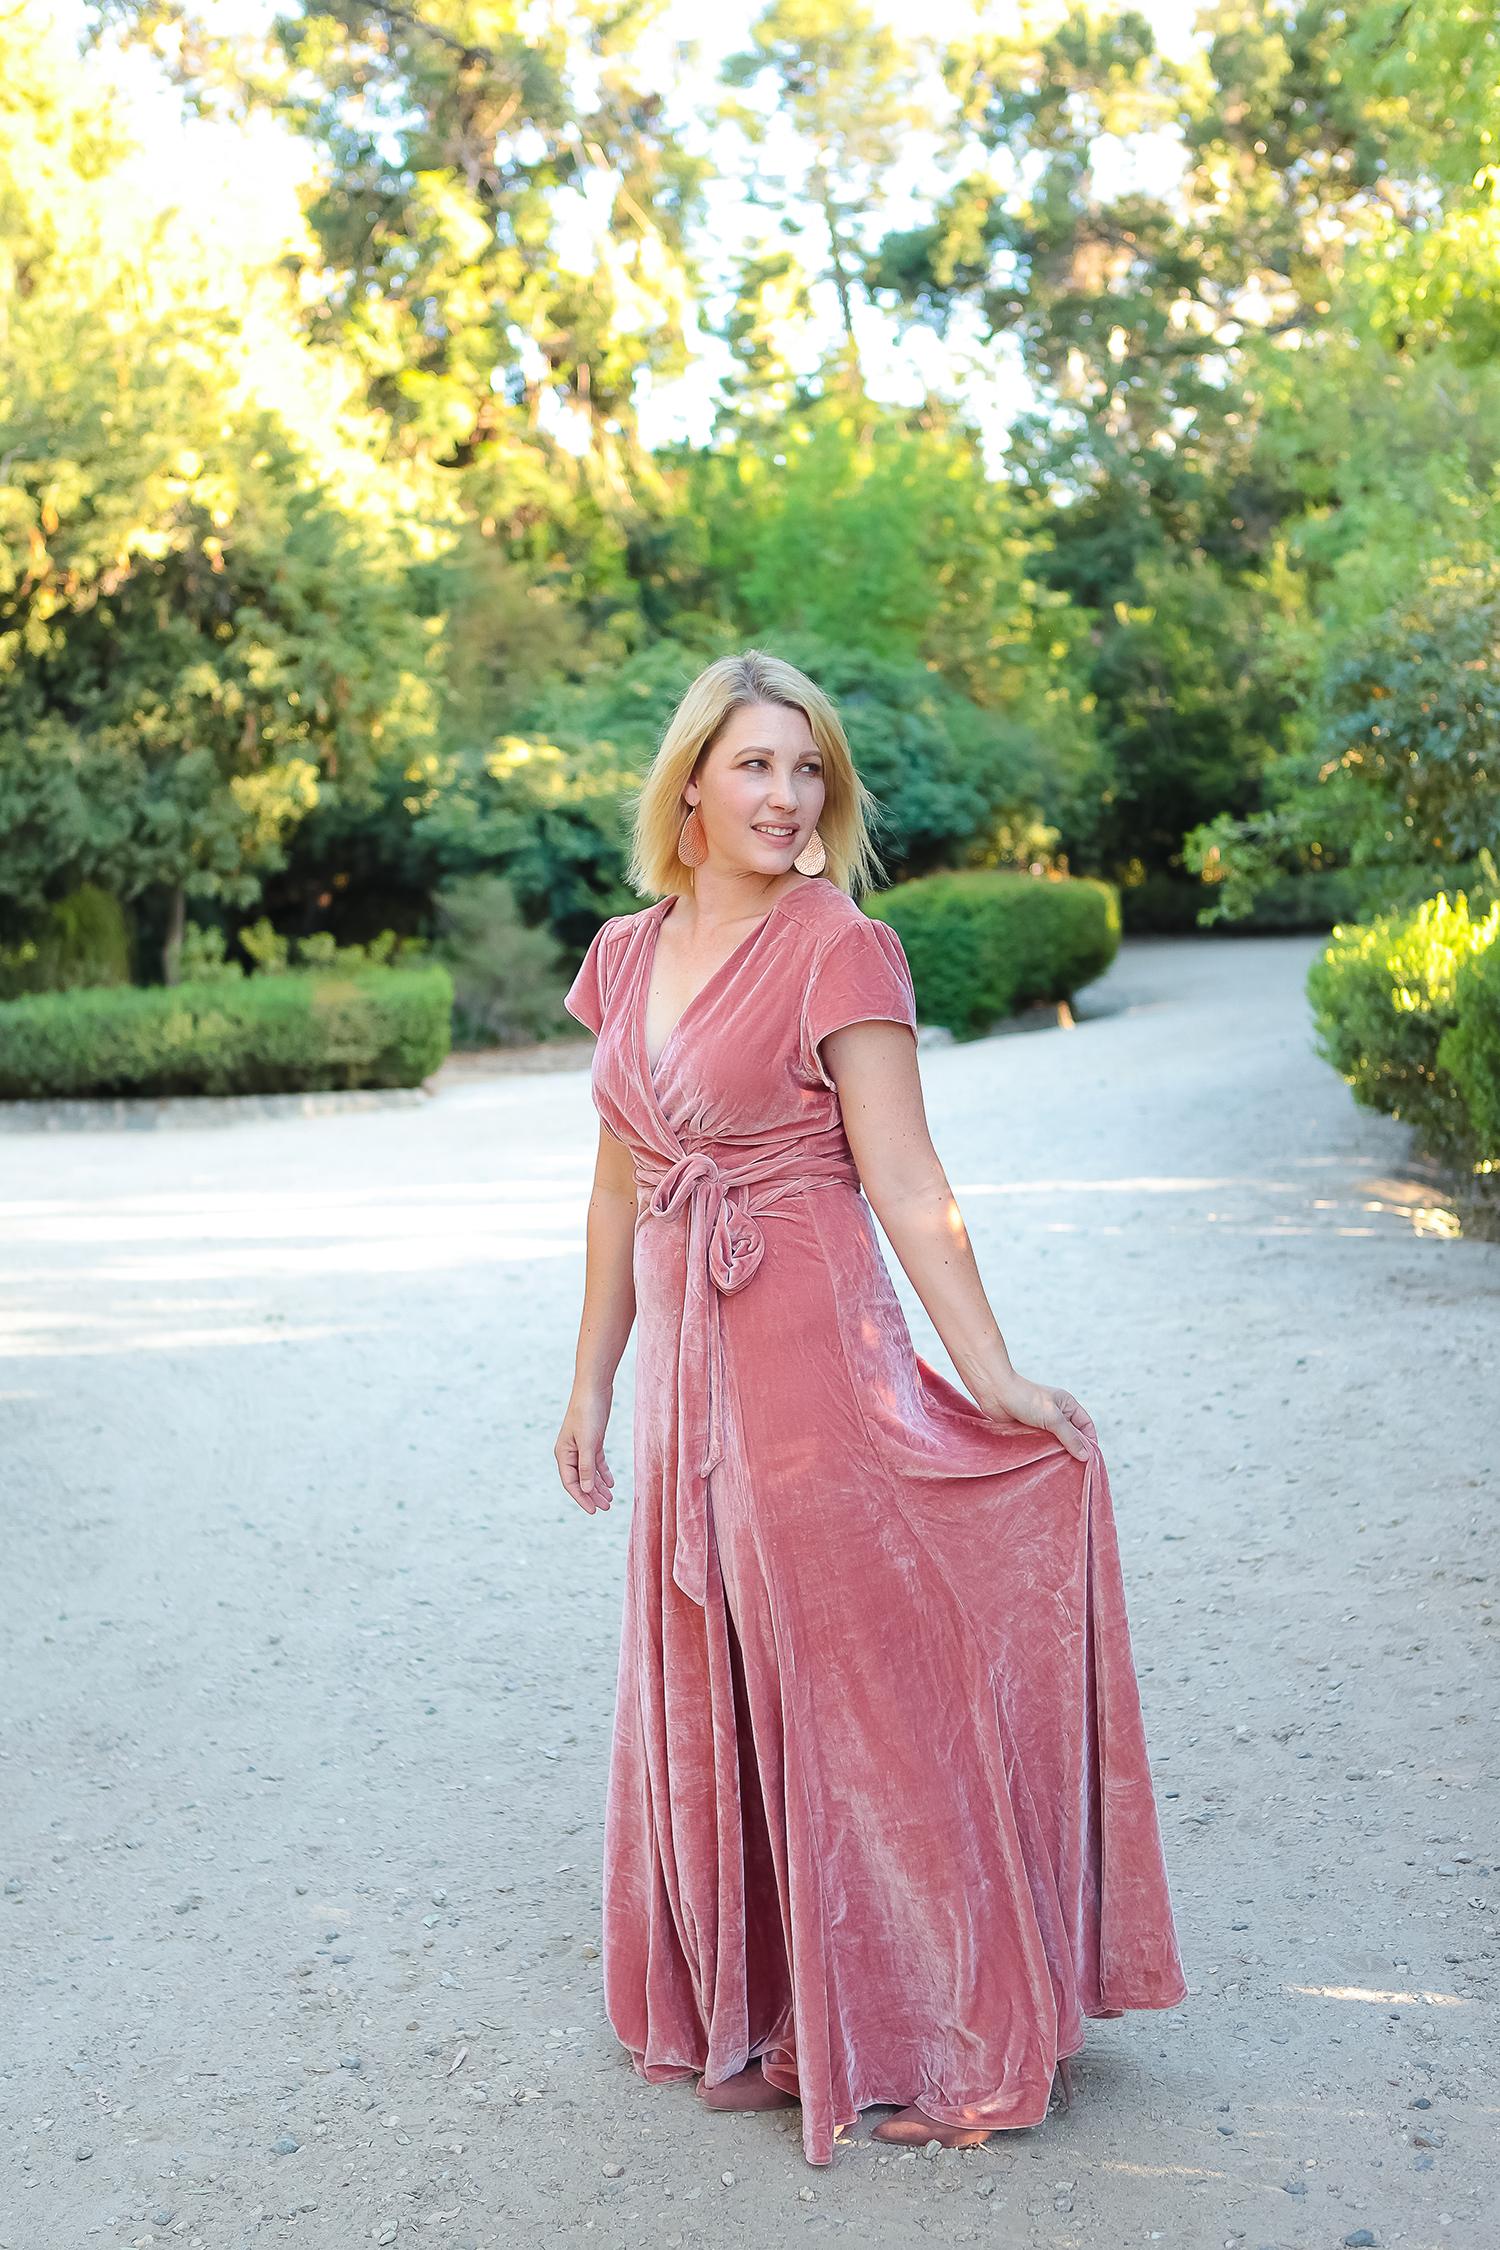 Looking for amazing holiday dresses that won't break the bank! I love this velvet dress! #holidaydresses #velvetdress